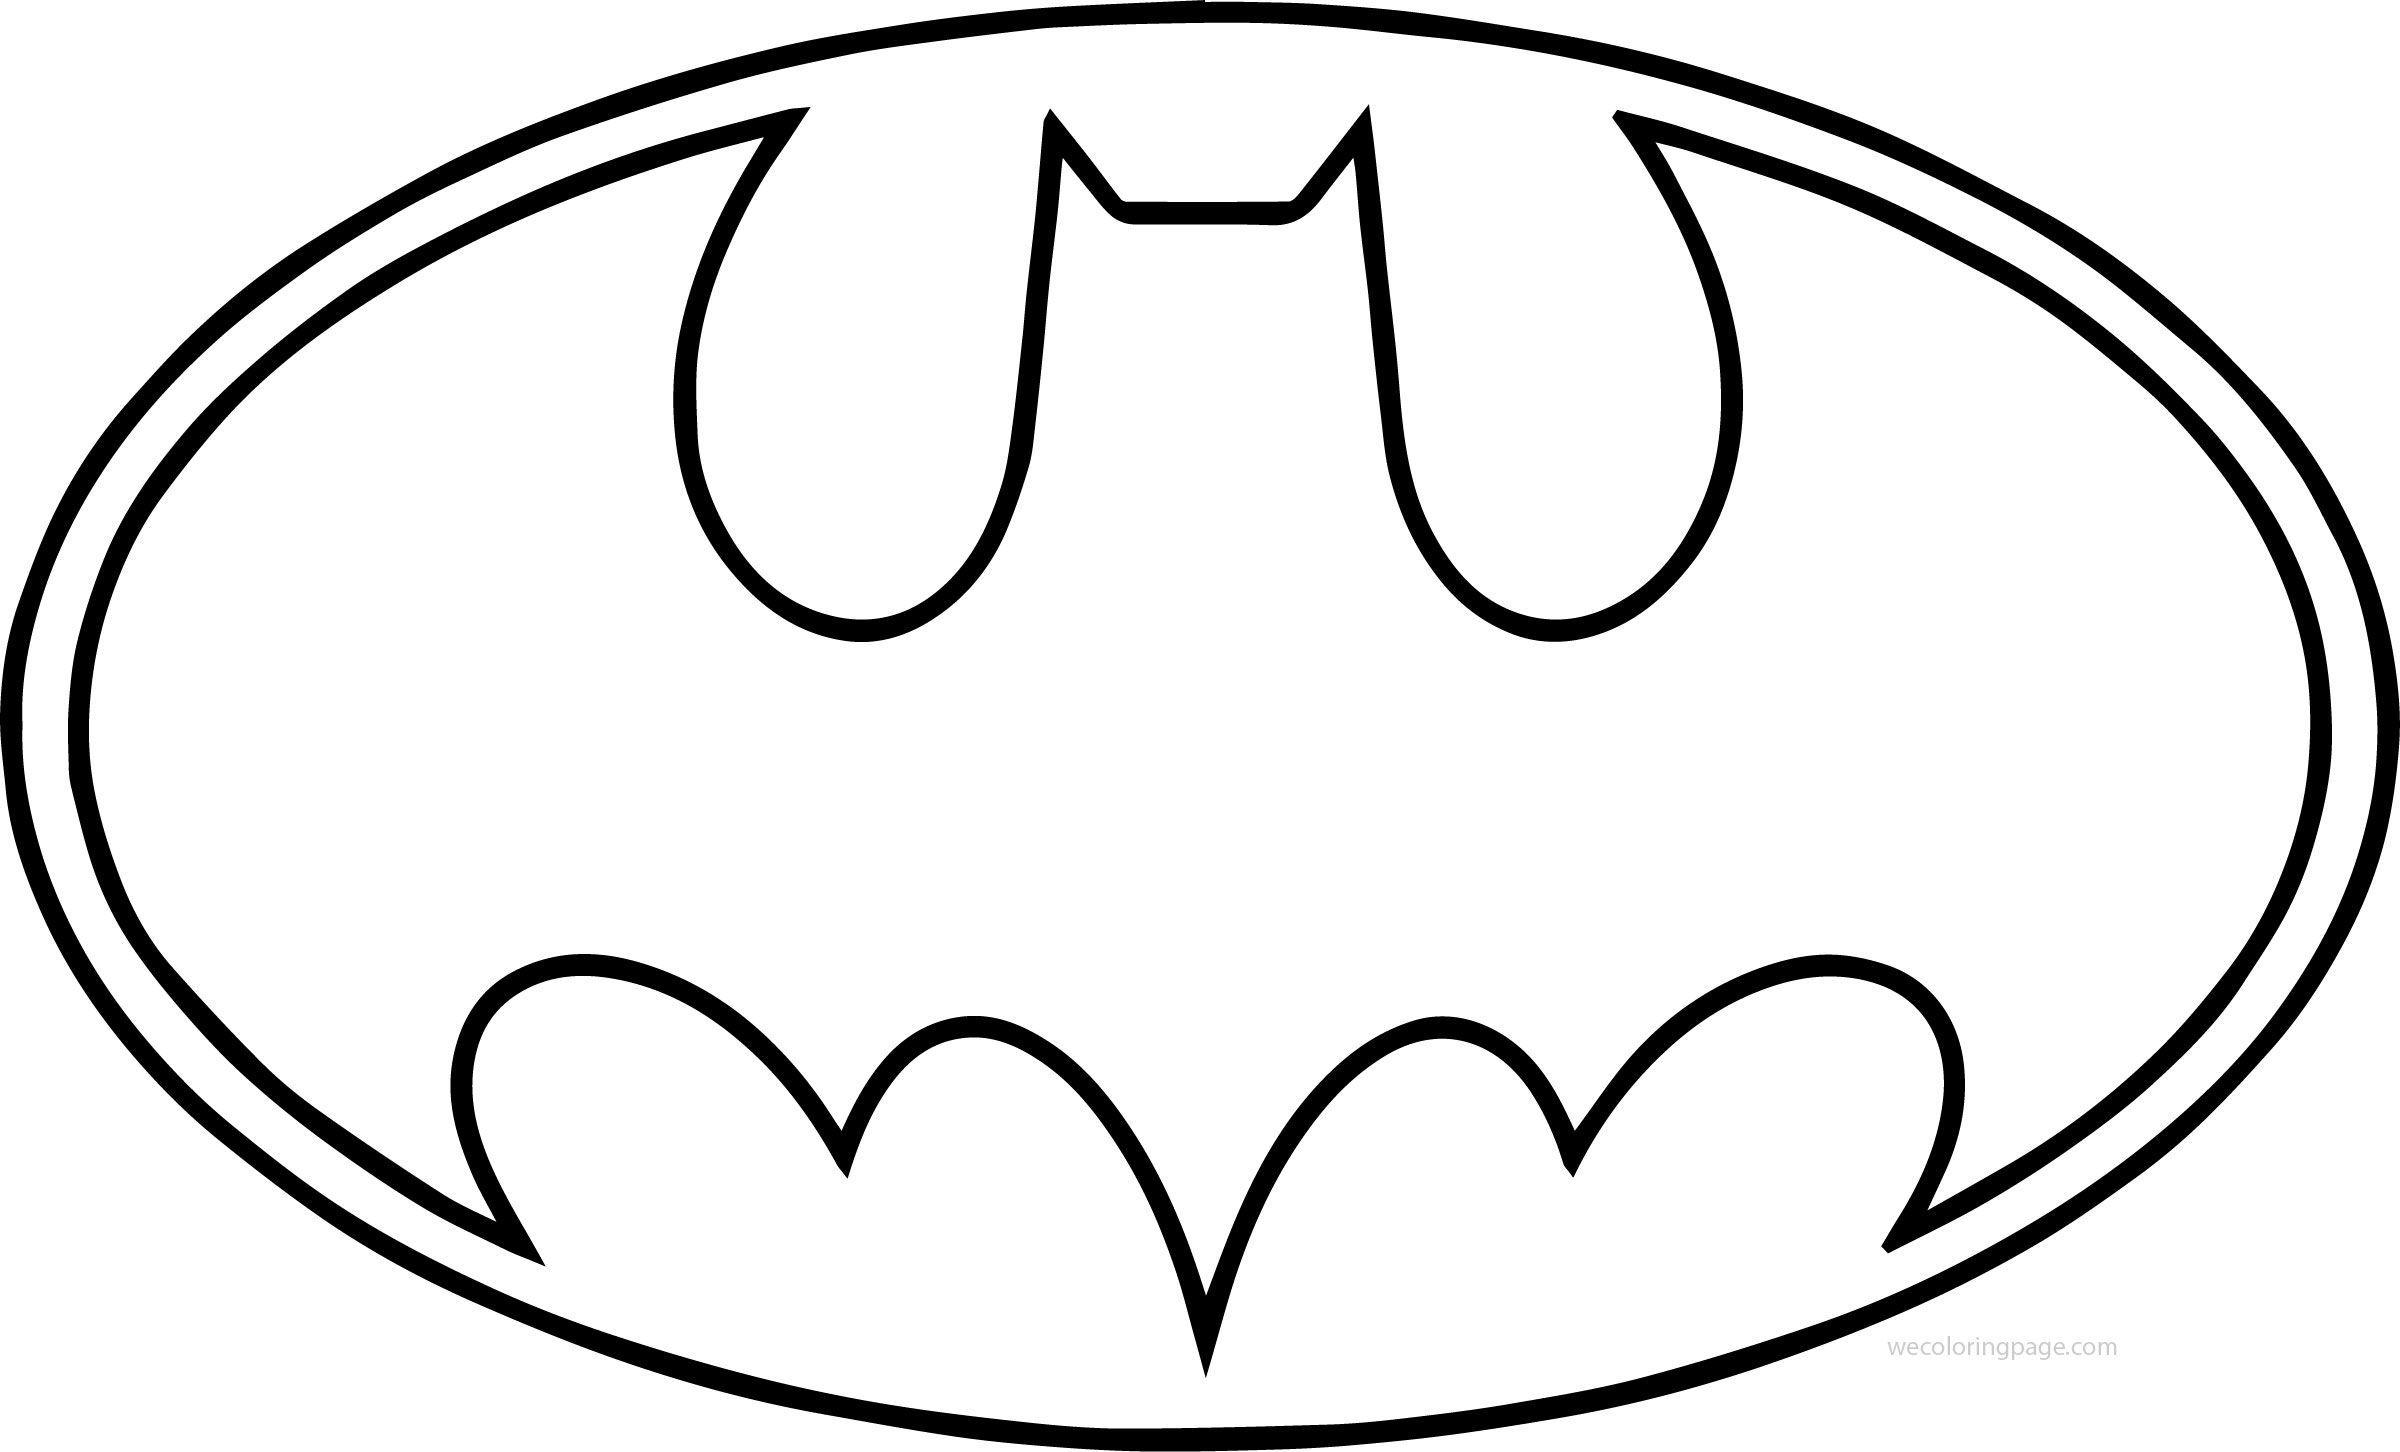 kleurplaat batman logo kleurplatenl